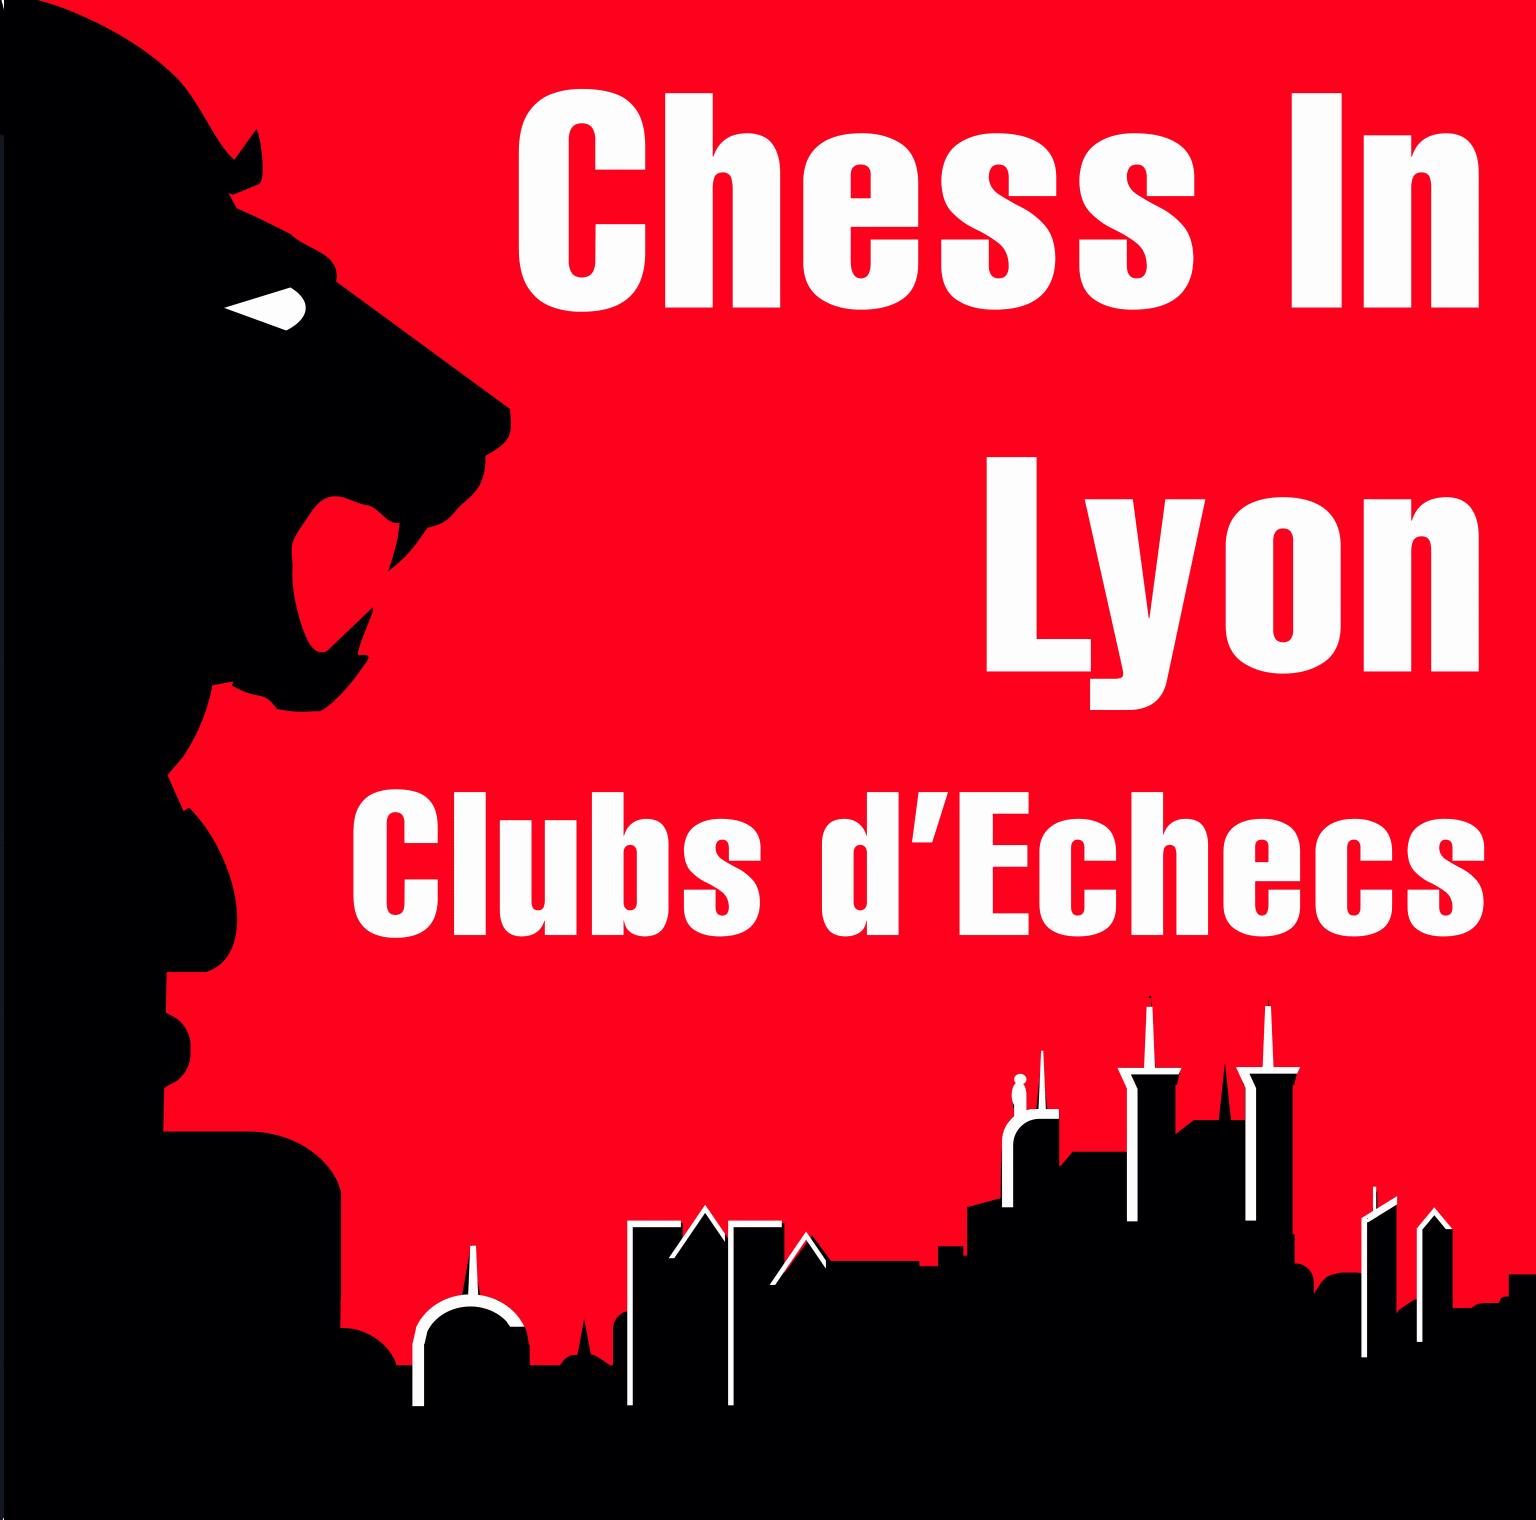 Logo-LOE-Chess-In-Lyon